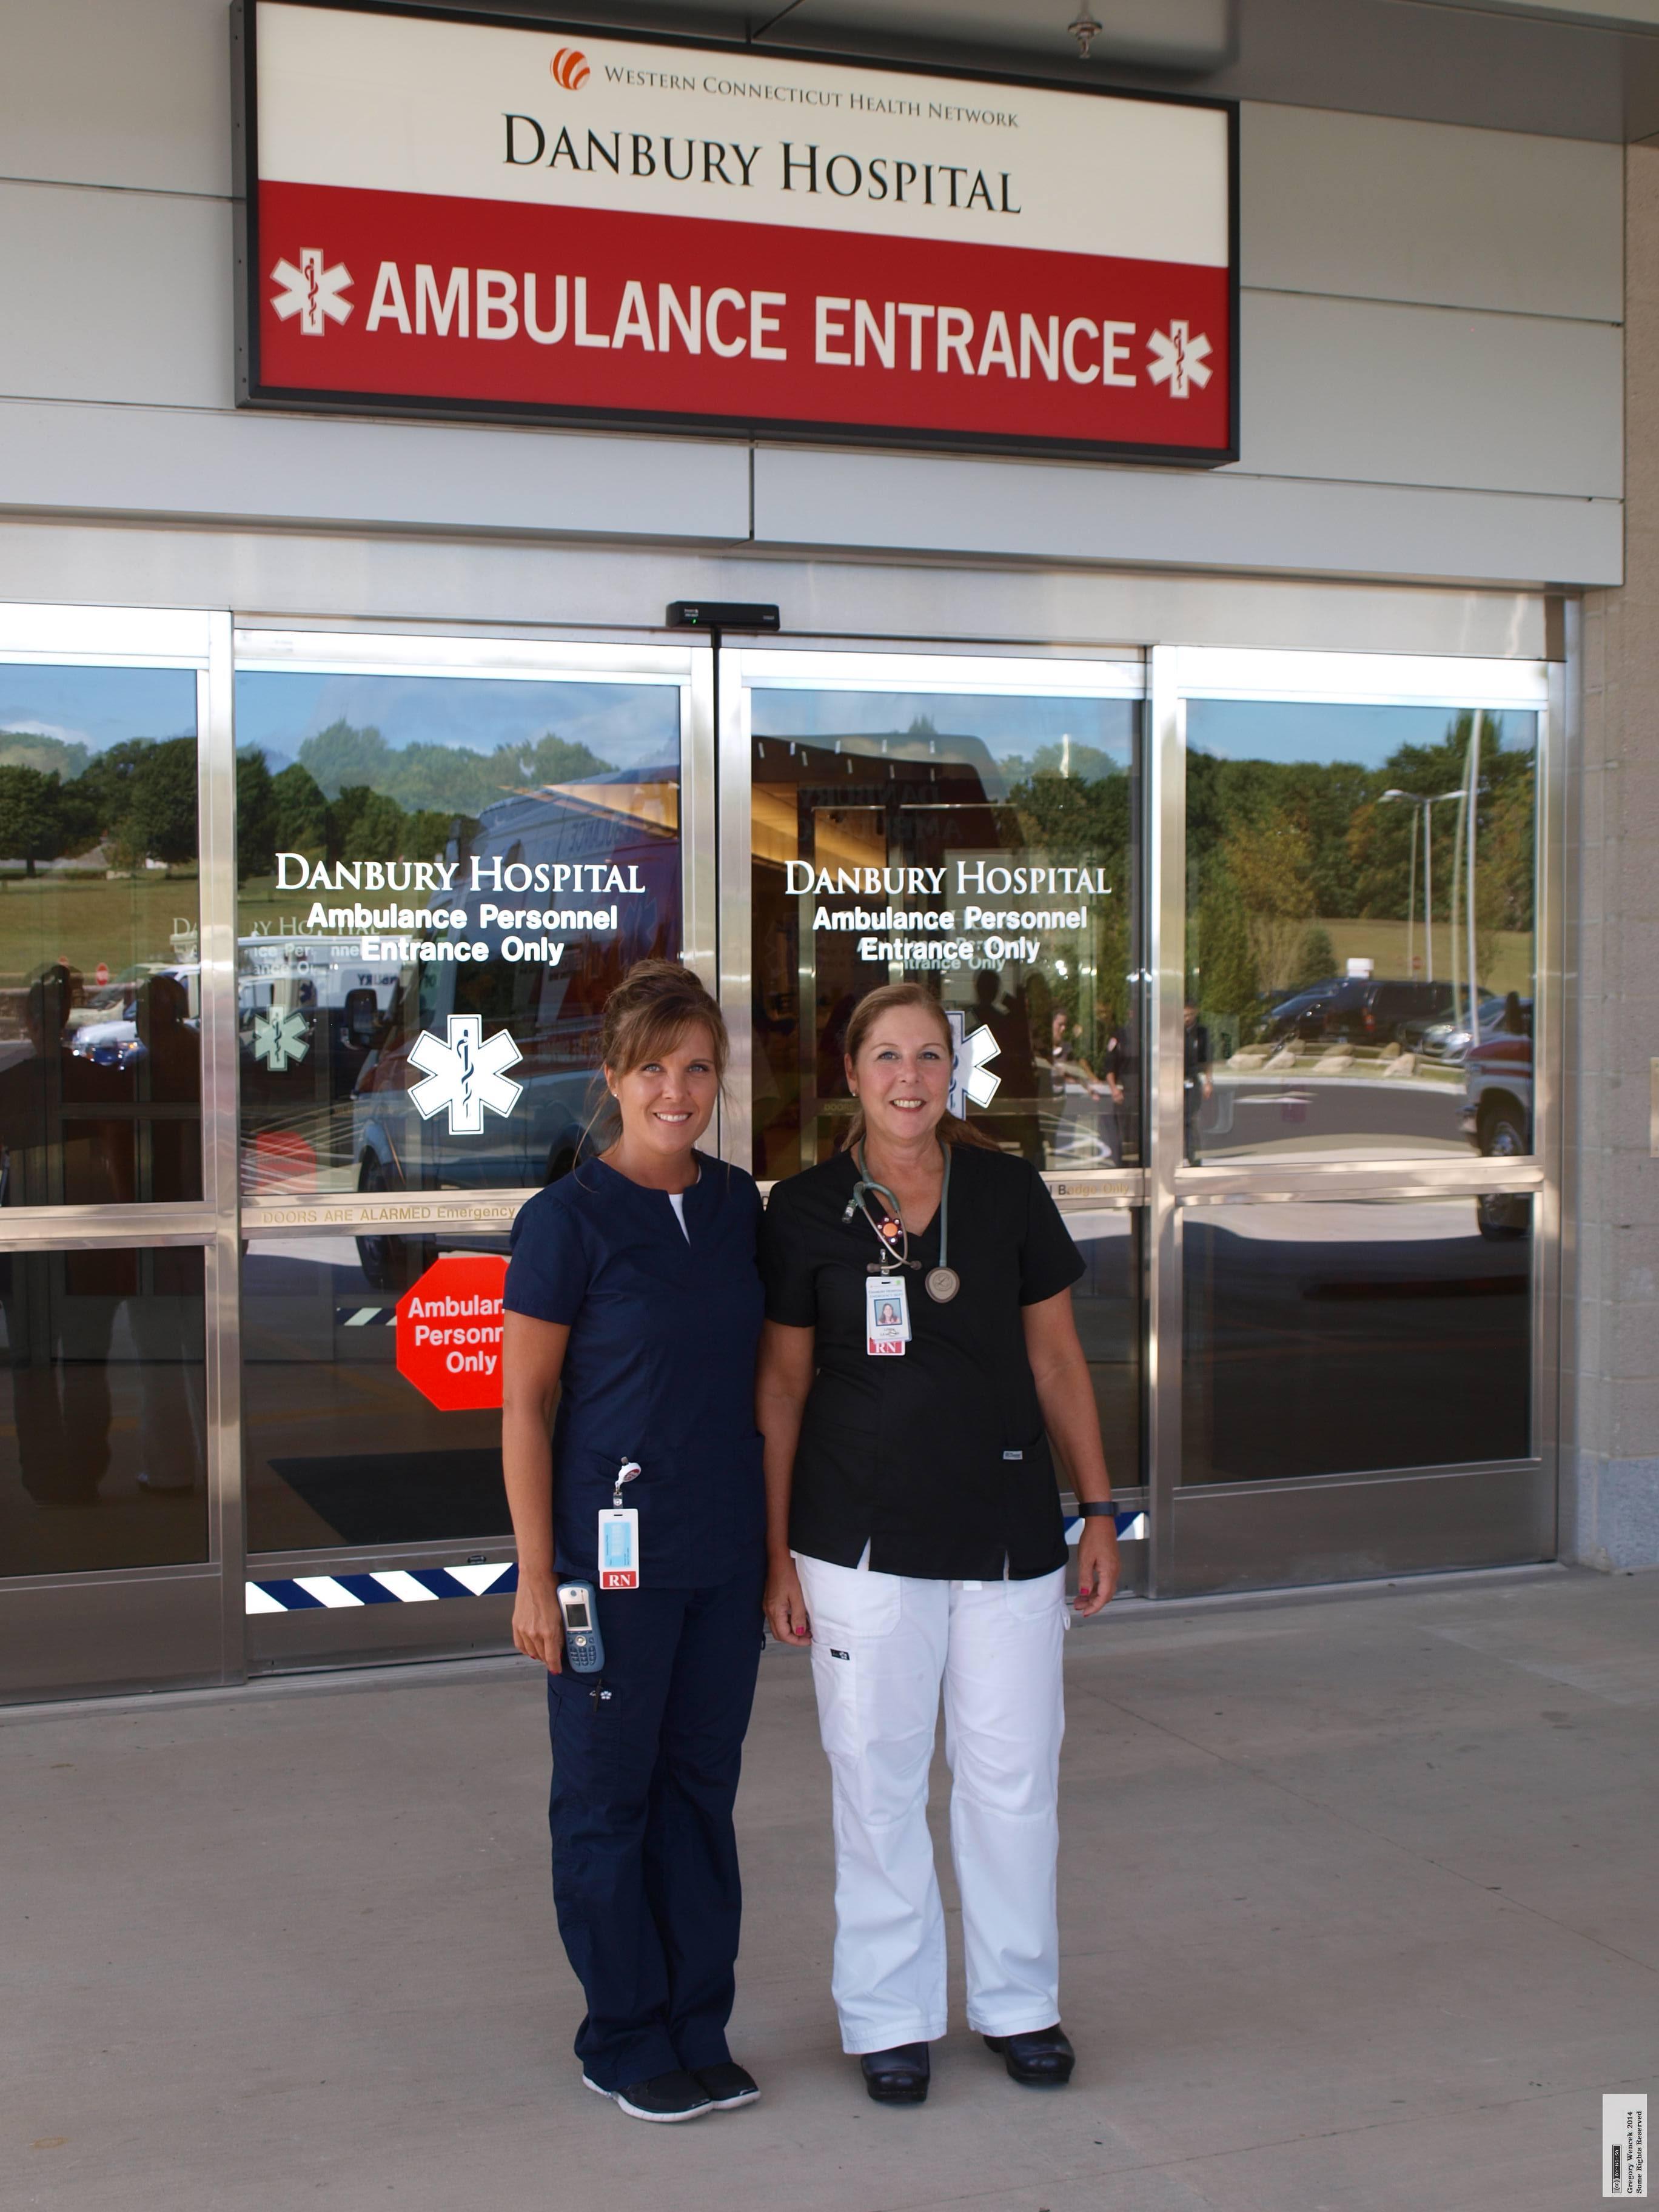 Danbury Hospital opens new Emergency Department today